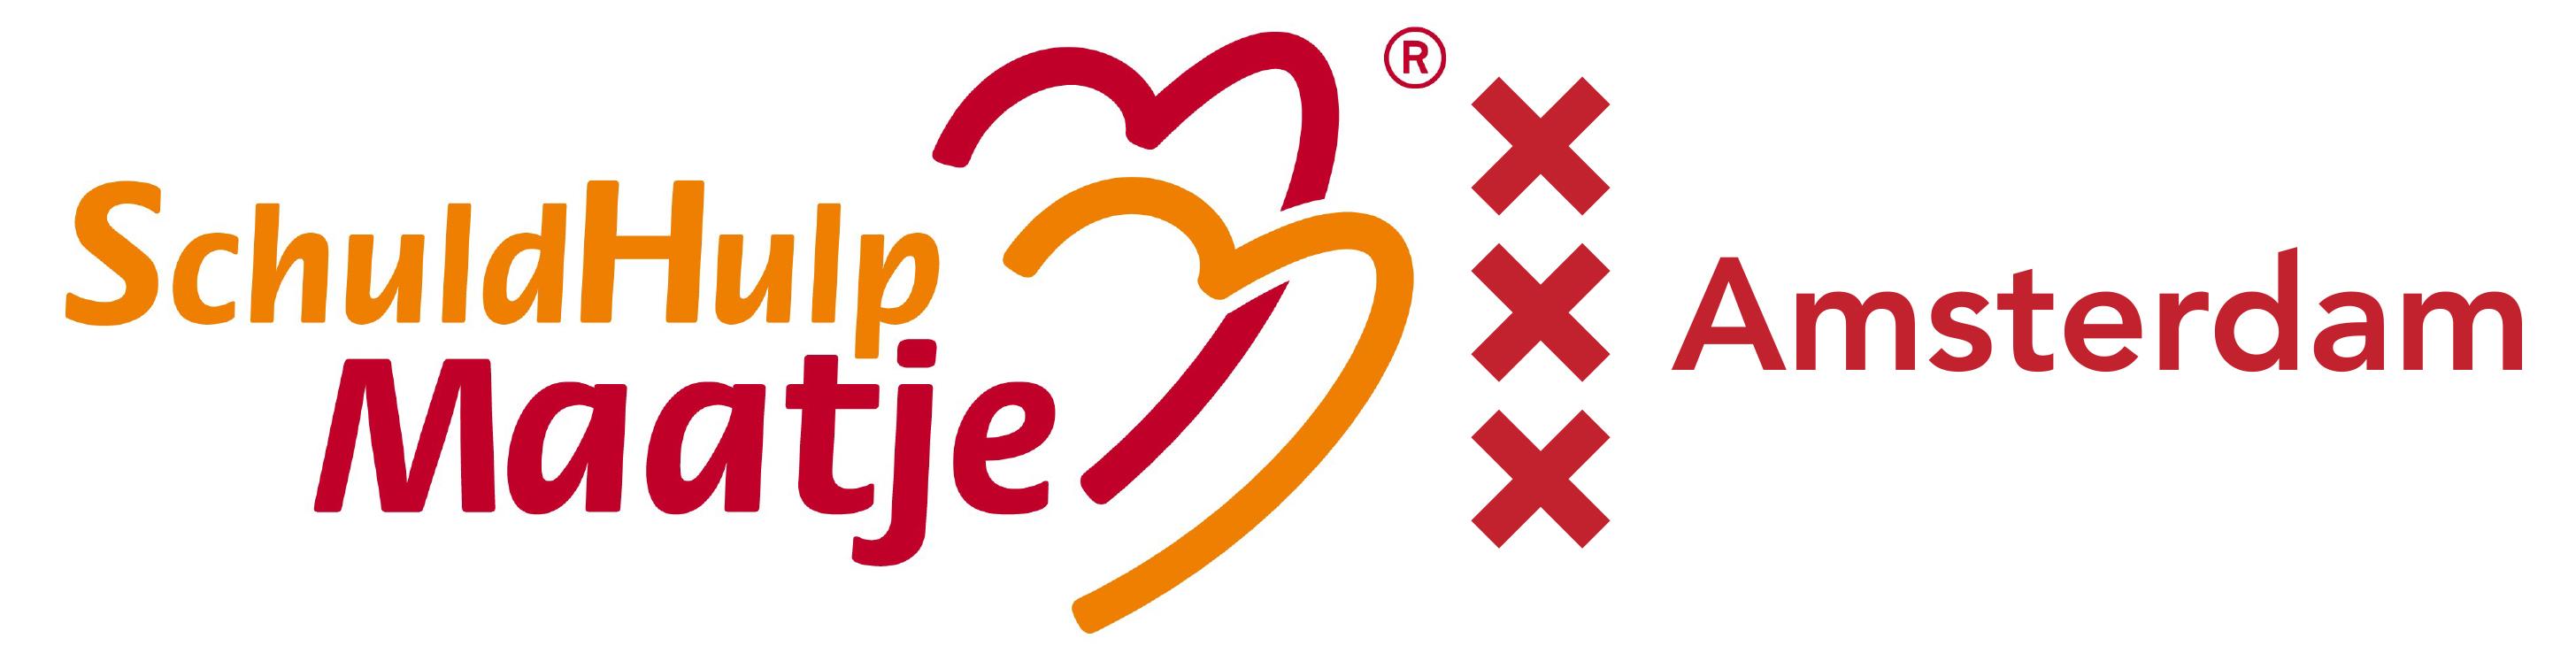 logo-shm-Amsterdam